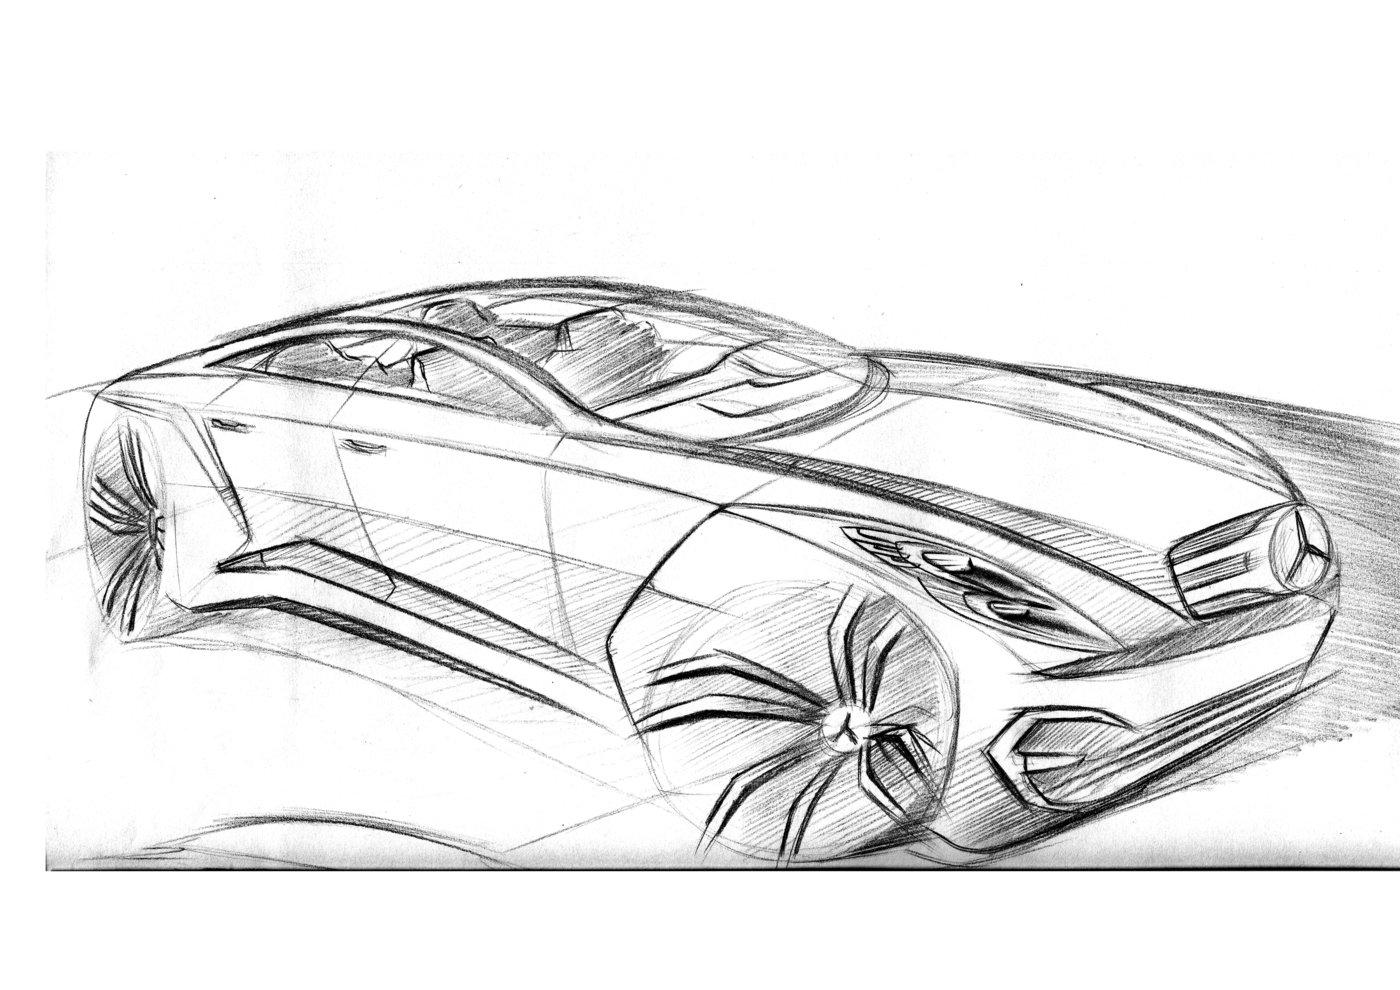 Mercedes-Benz by Ozgun Culam at Coroflot.com